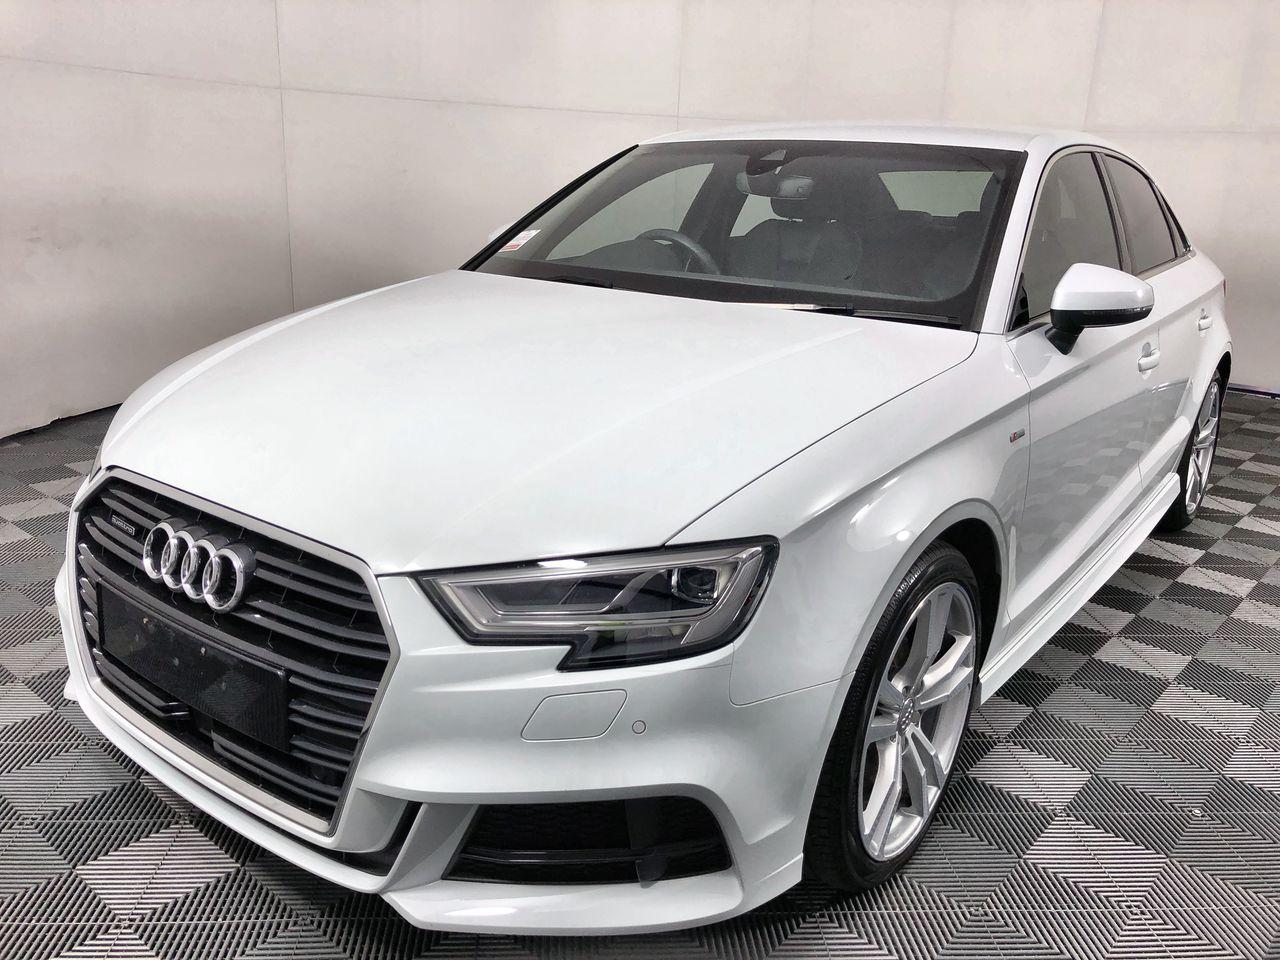 2016 Audi A3 2.0 TFSI QUATT S LIN 8V Automatic Sedan